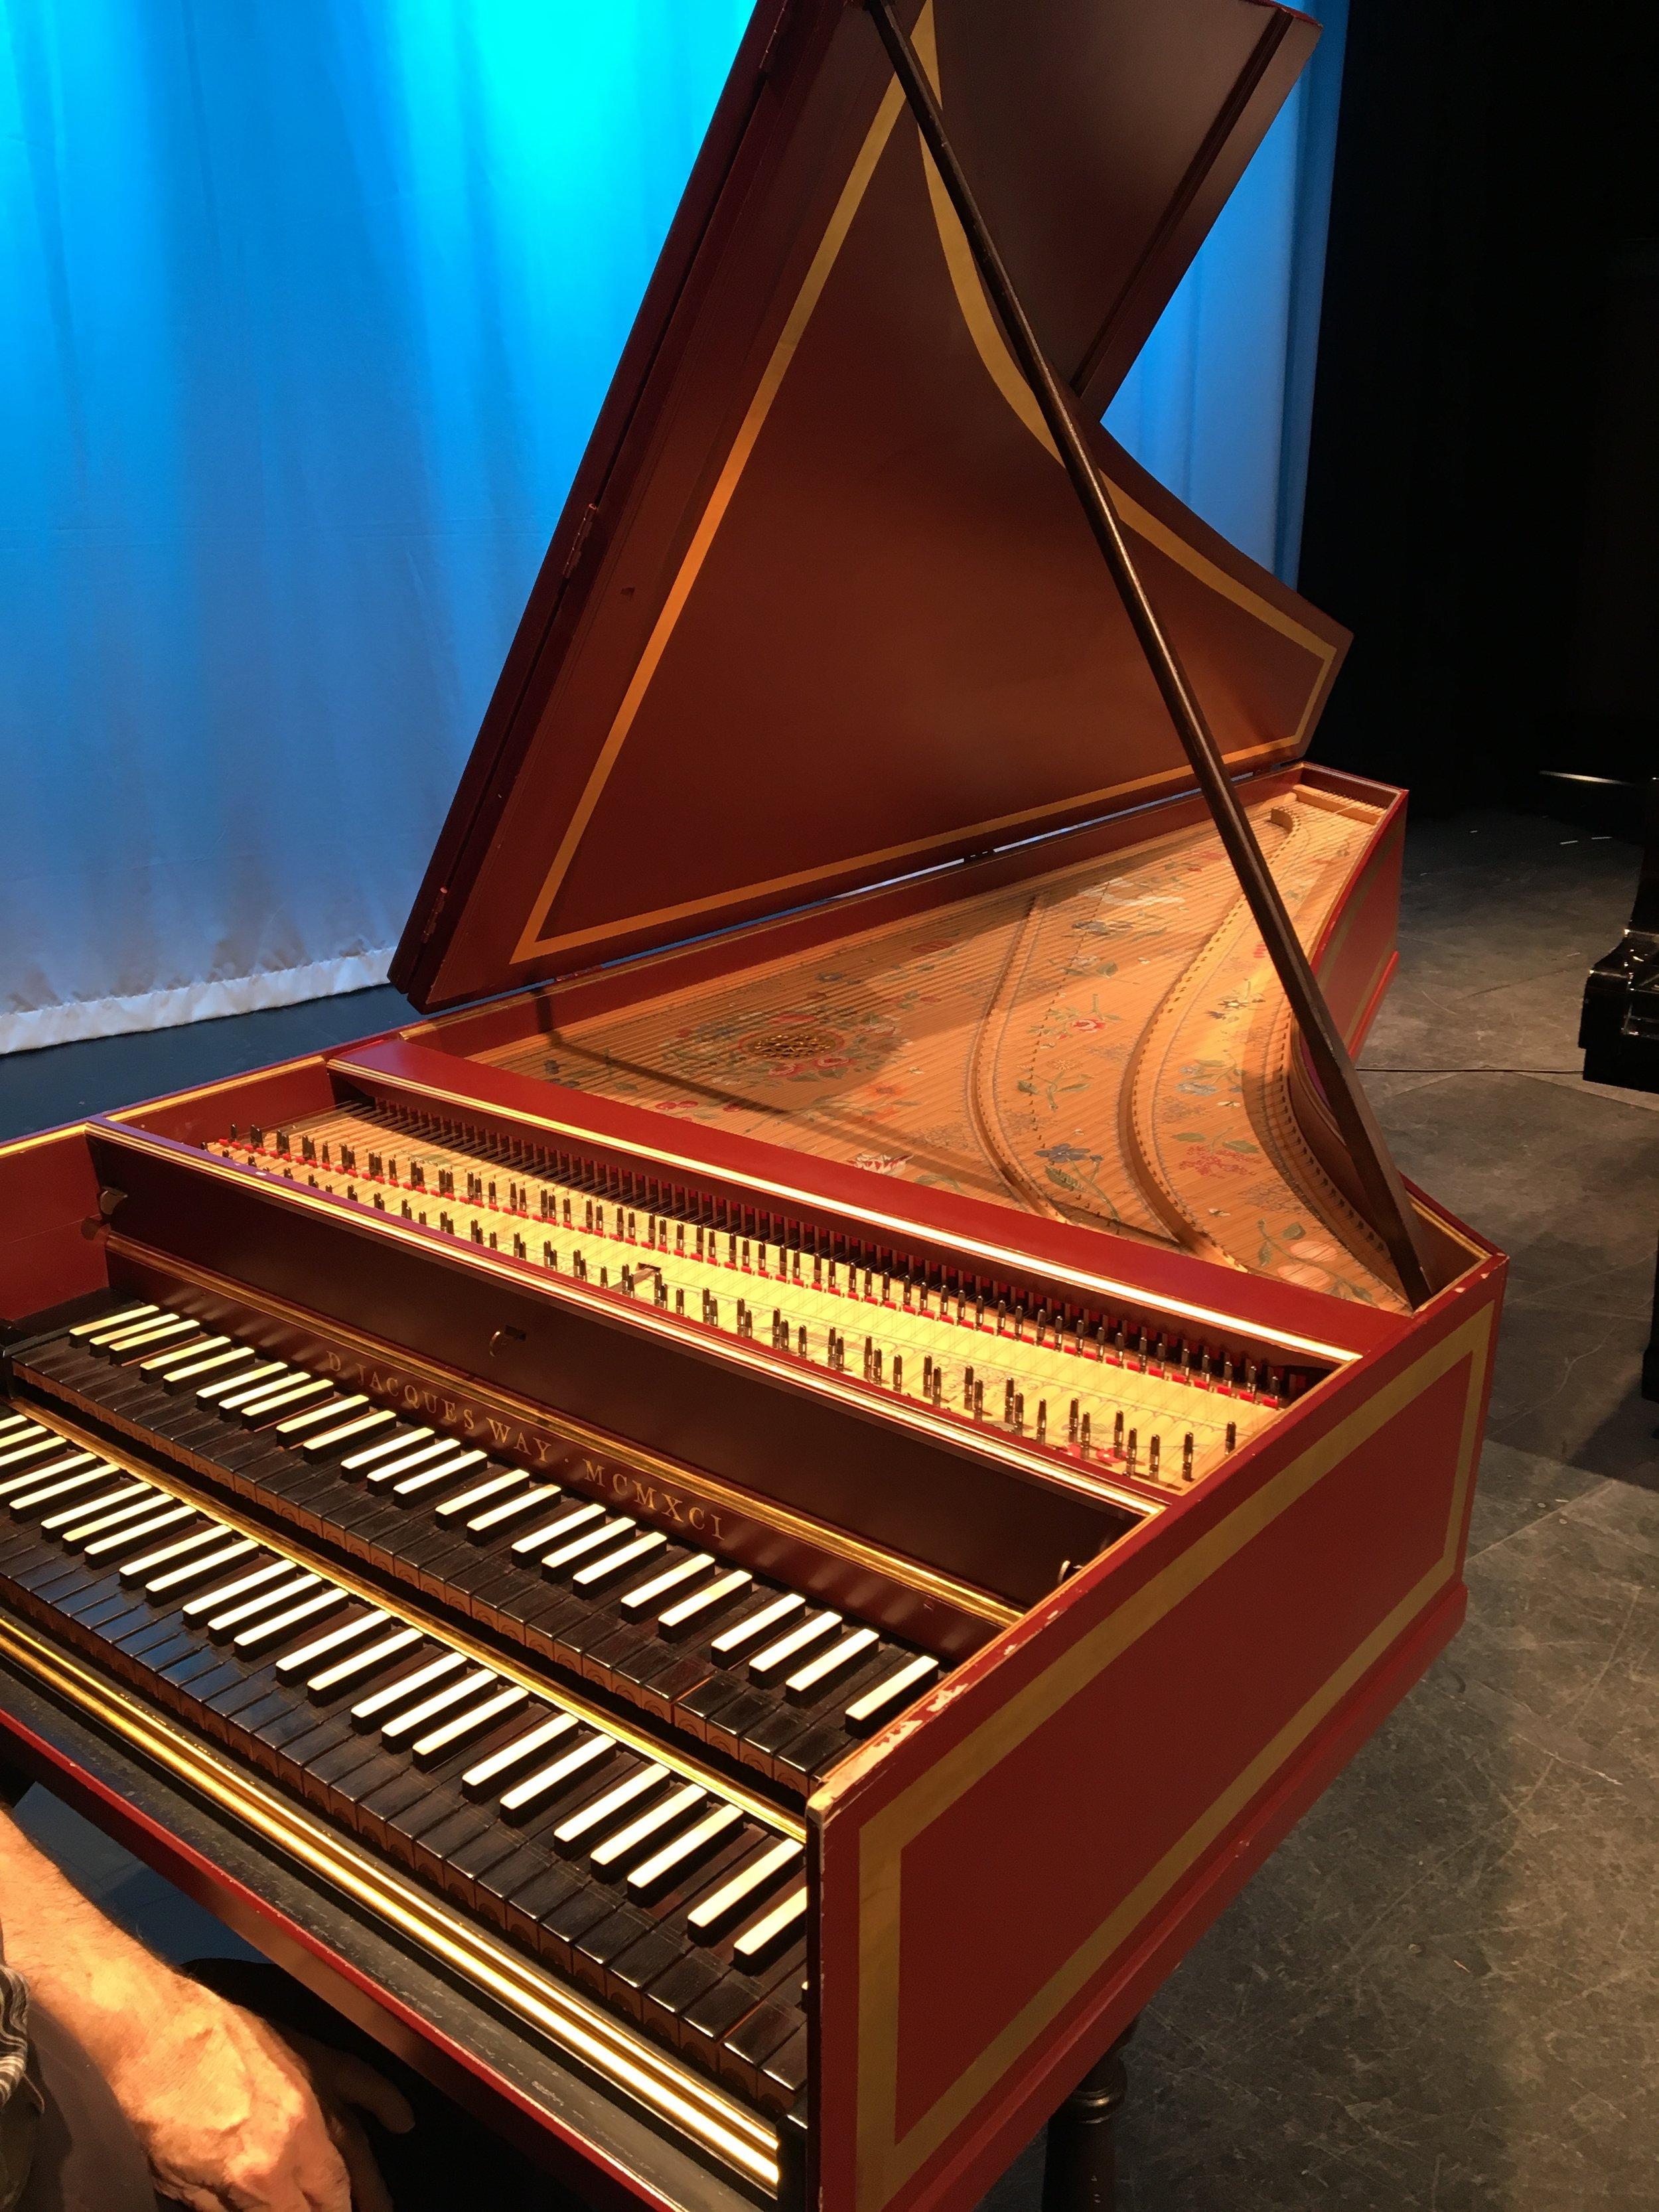 That beautiful harpsichord!